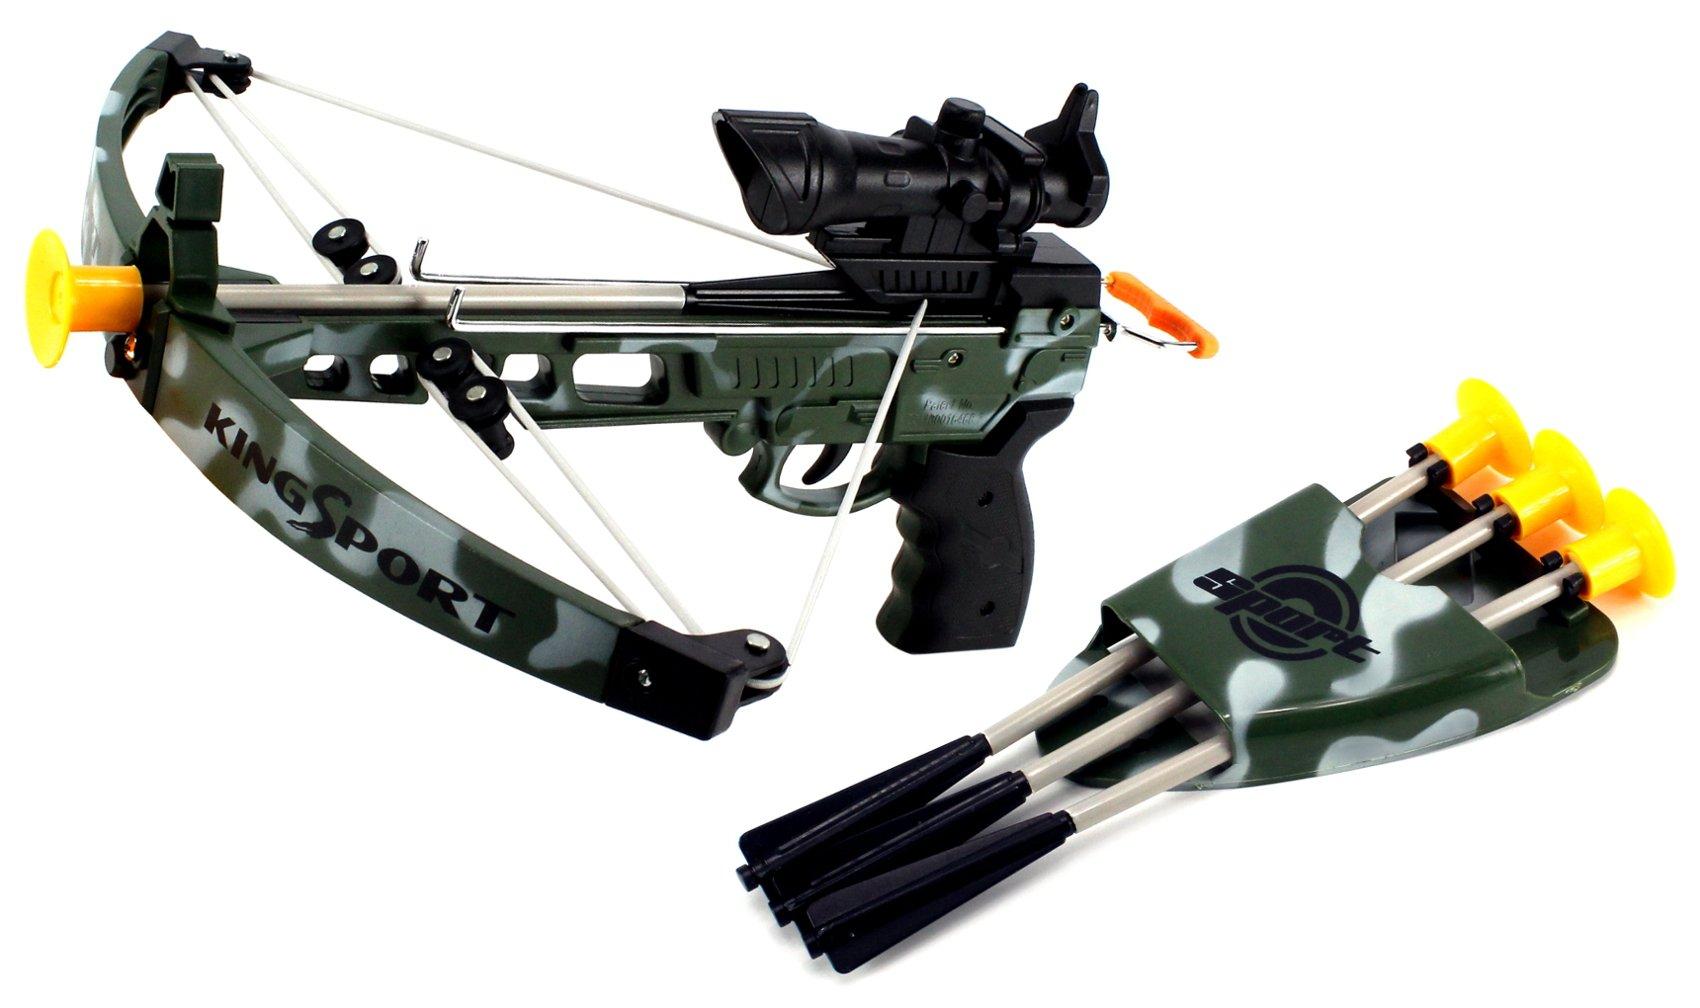 K-Sport Military Army Camo Toy Crossbow Dart Play Set w/Practice Target, 4 Dart Arrows, Arrow Holder, Mock Scope